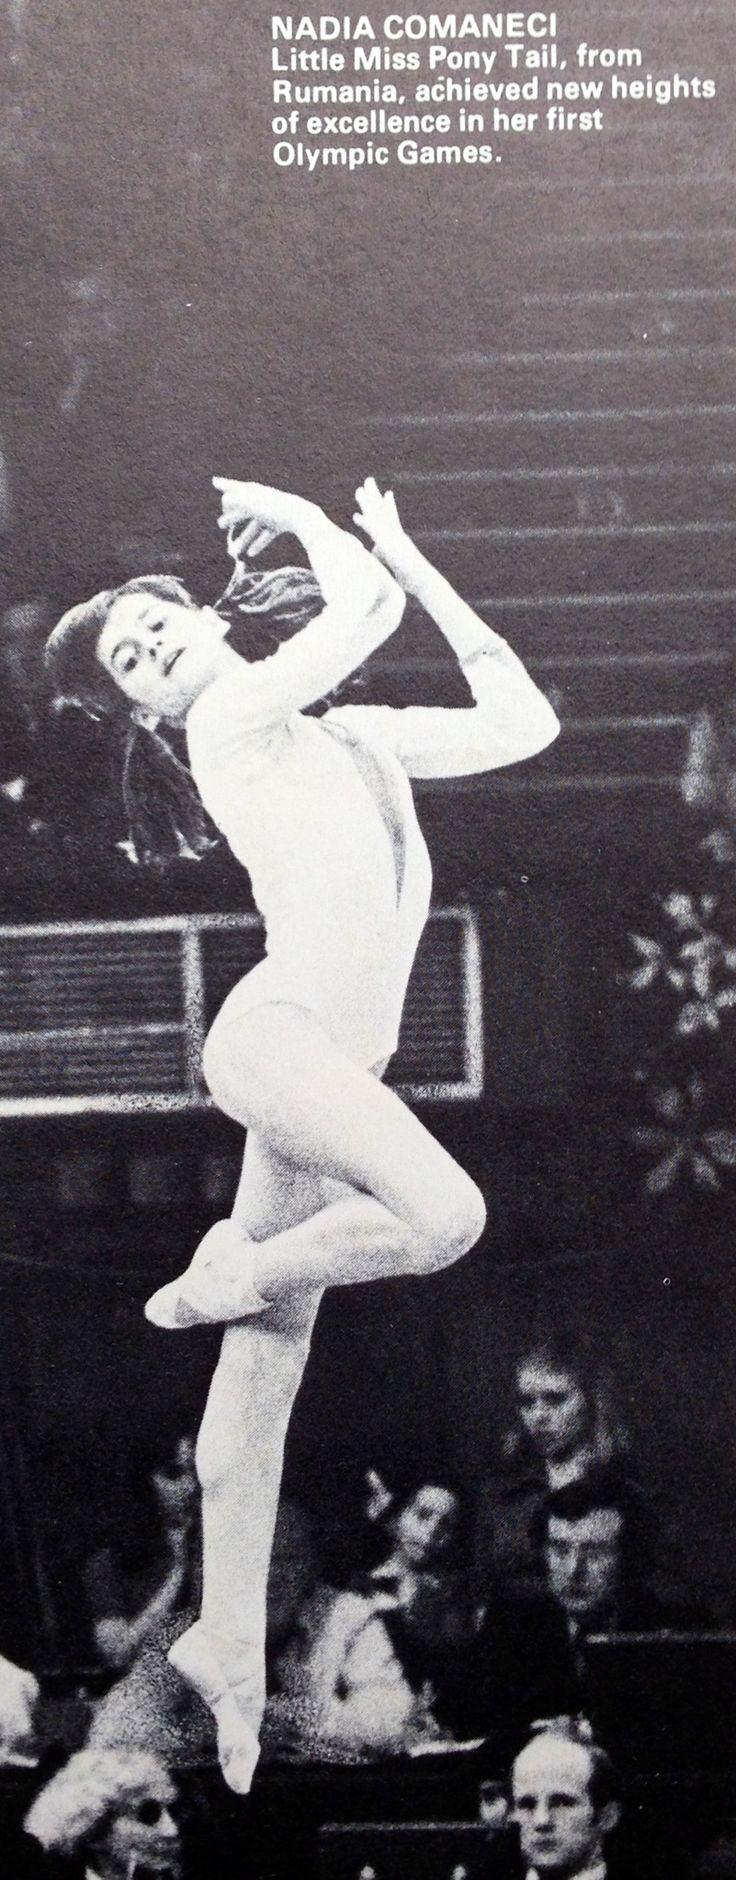 "Nadia Comaneci Romania 1970s Gymnastics  ""Little miss pony tail"""